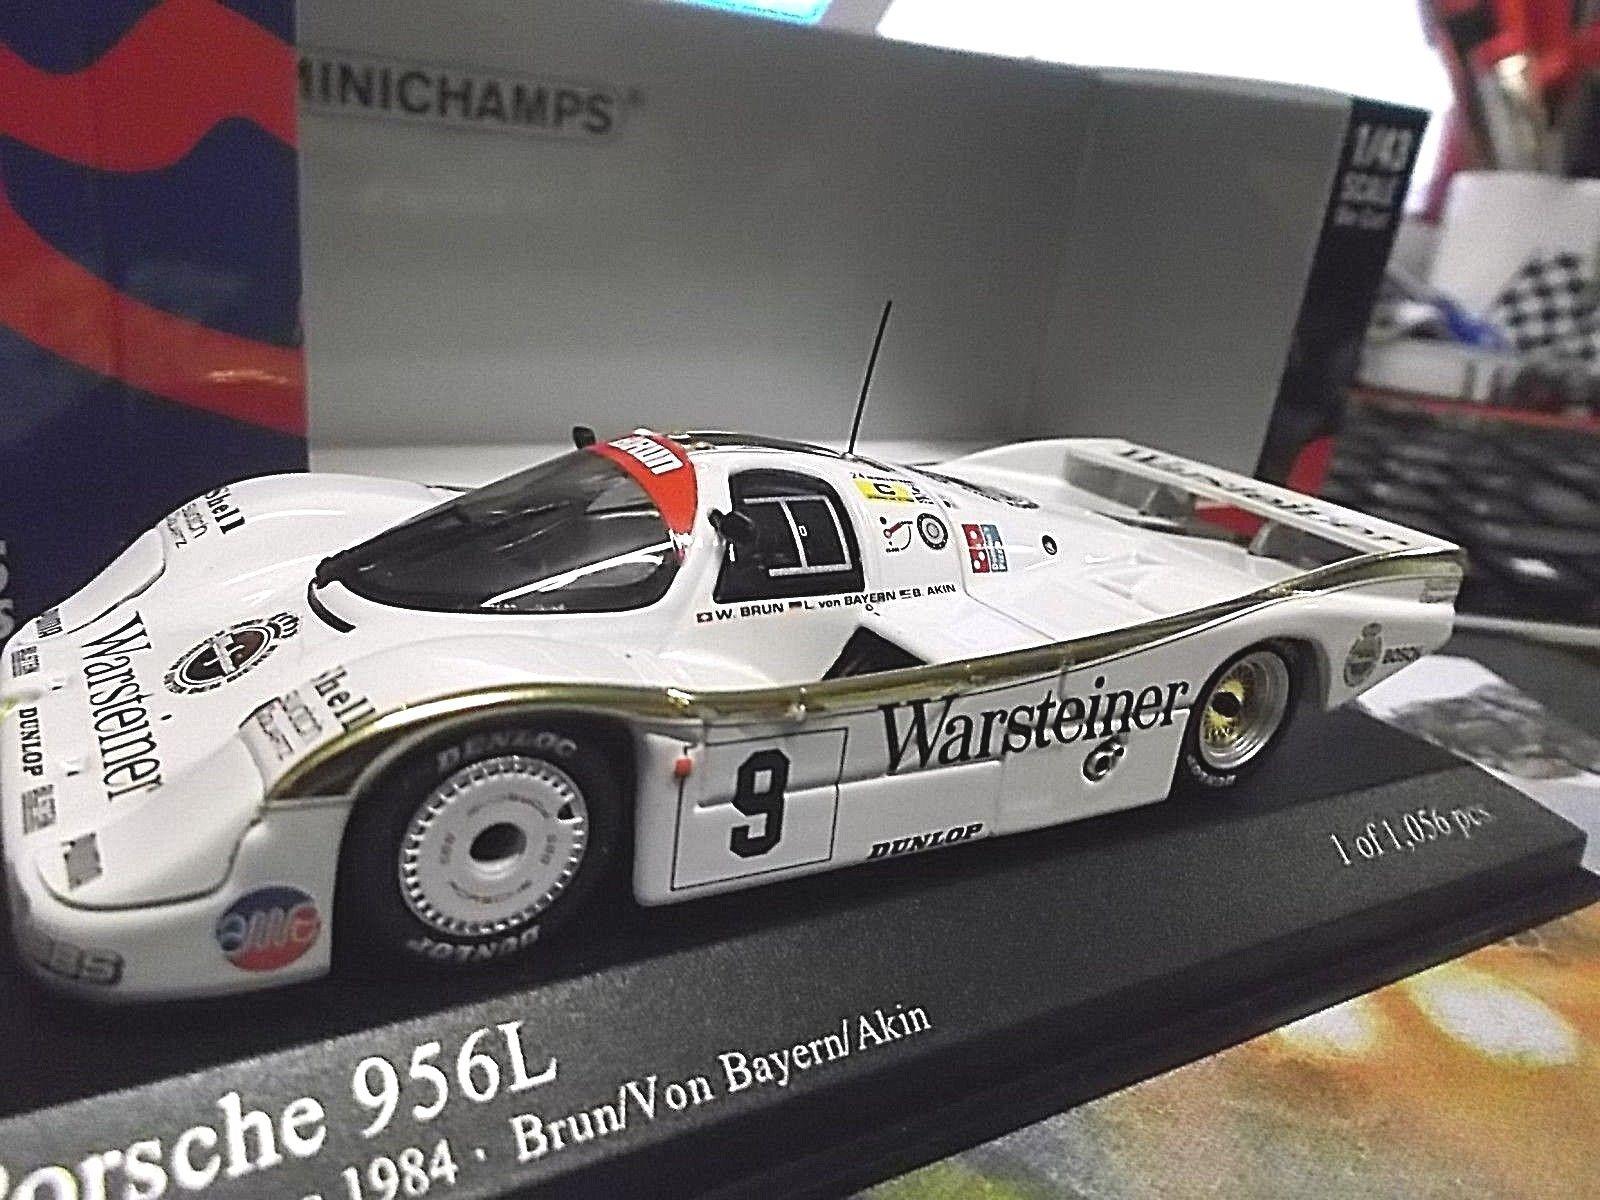 PORSCHE 956l 956 Lang poppa le Mans 1984 Warsteiner  9 Brun V. BA Minichamps 1:43